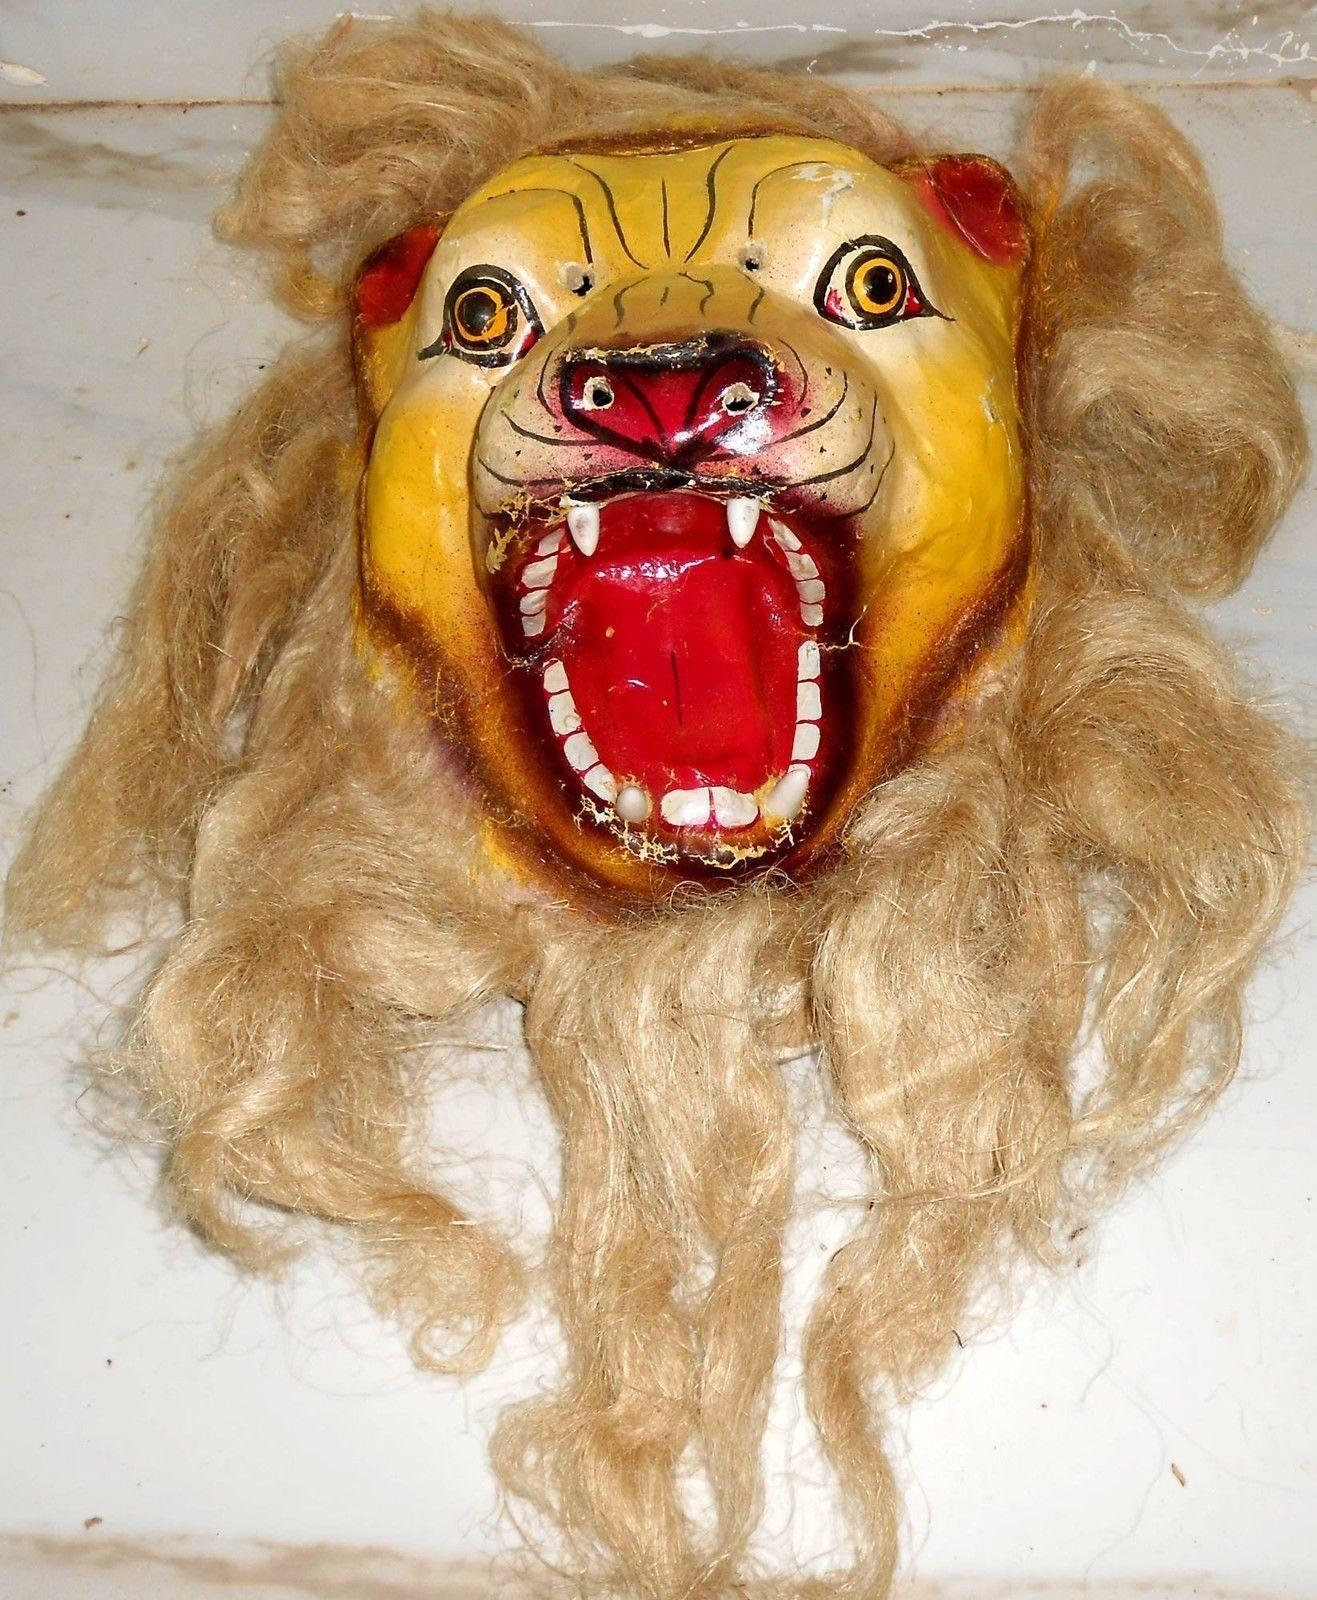 http://www.ebay.com/itm/India-Unique-Paper-Mache-Mask-Lion-Yellow ...